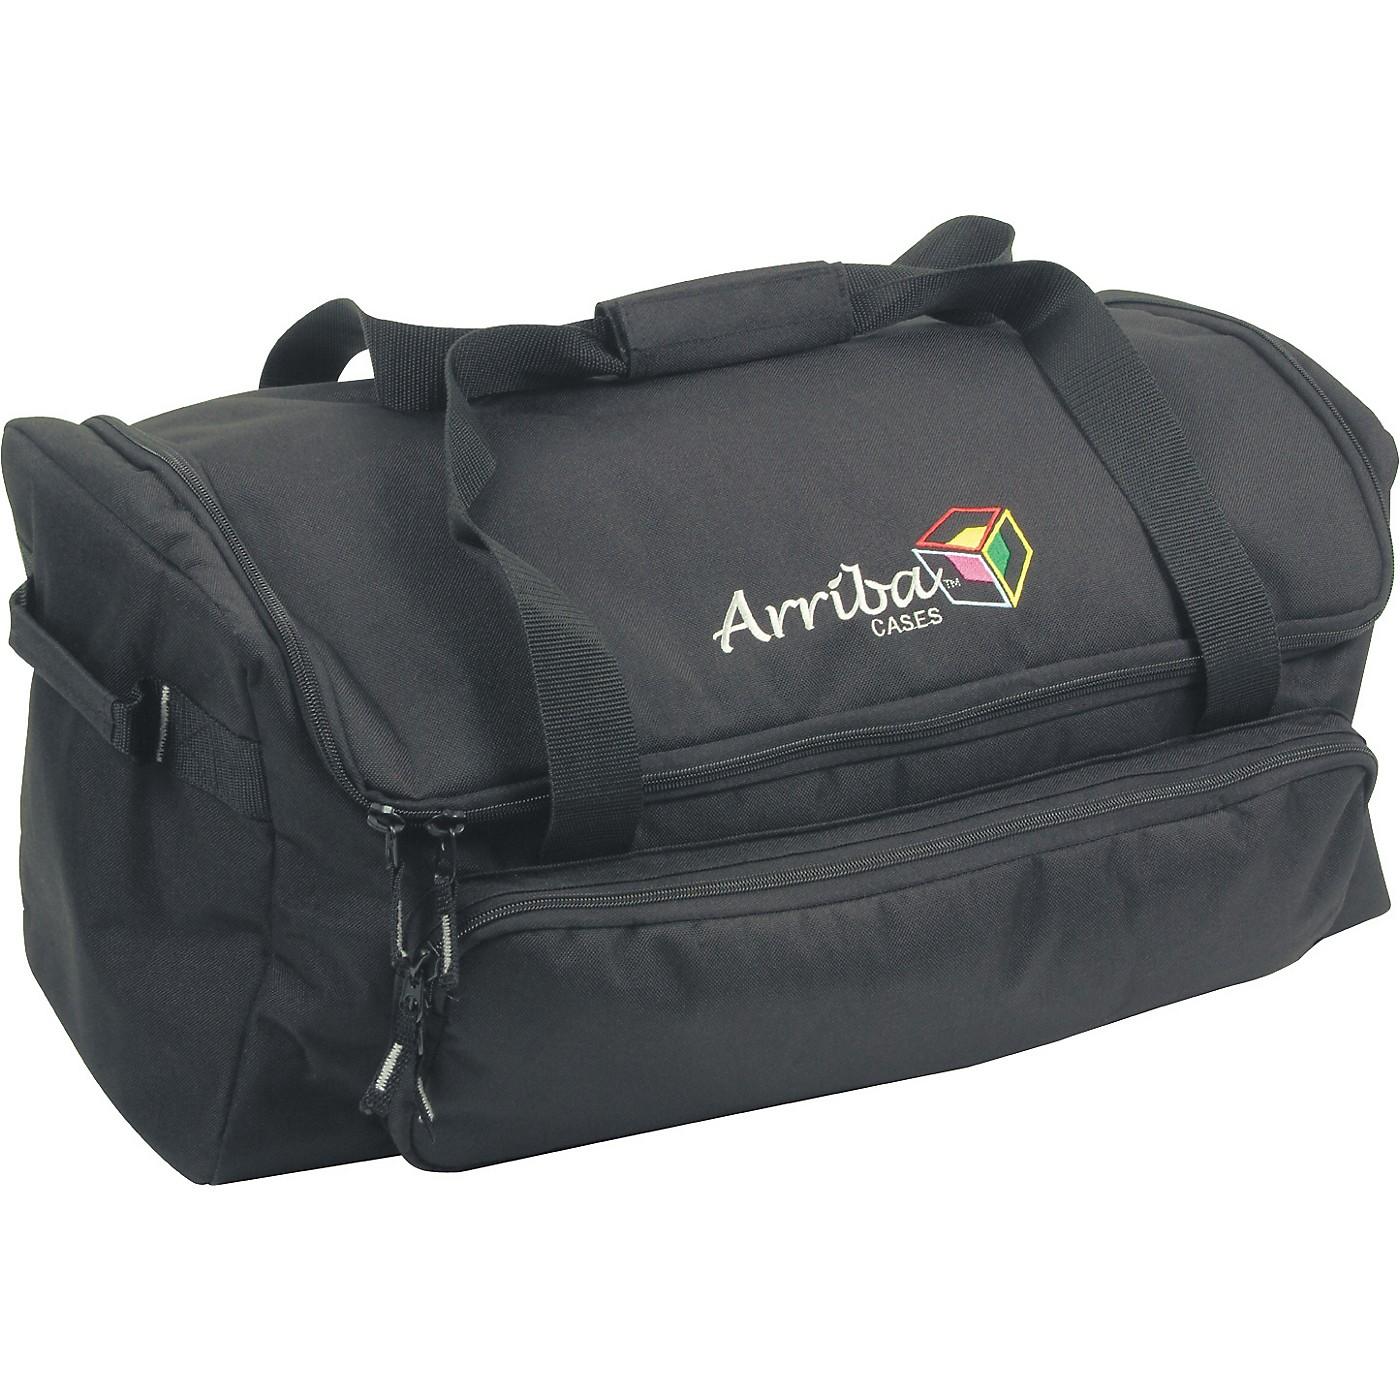 Arriba Cases AC-140 Lighting Fixture Bag thumbnail